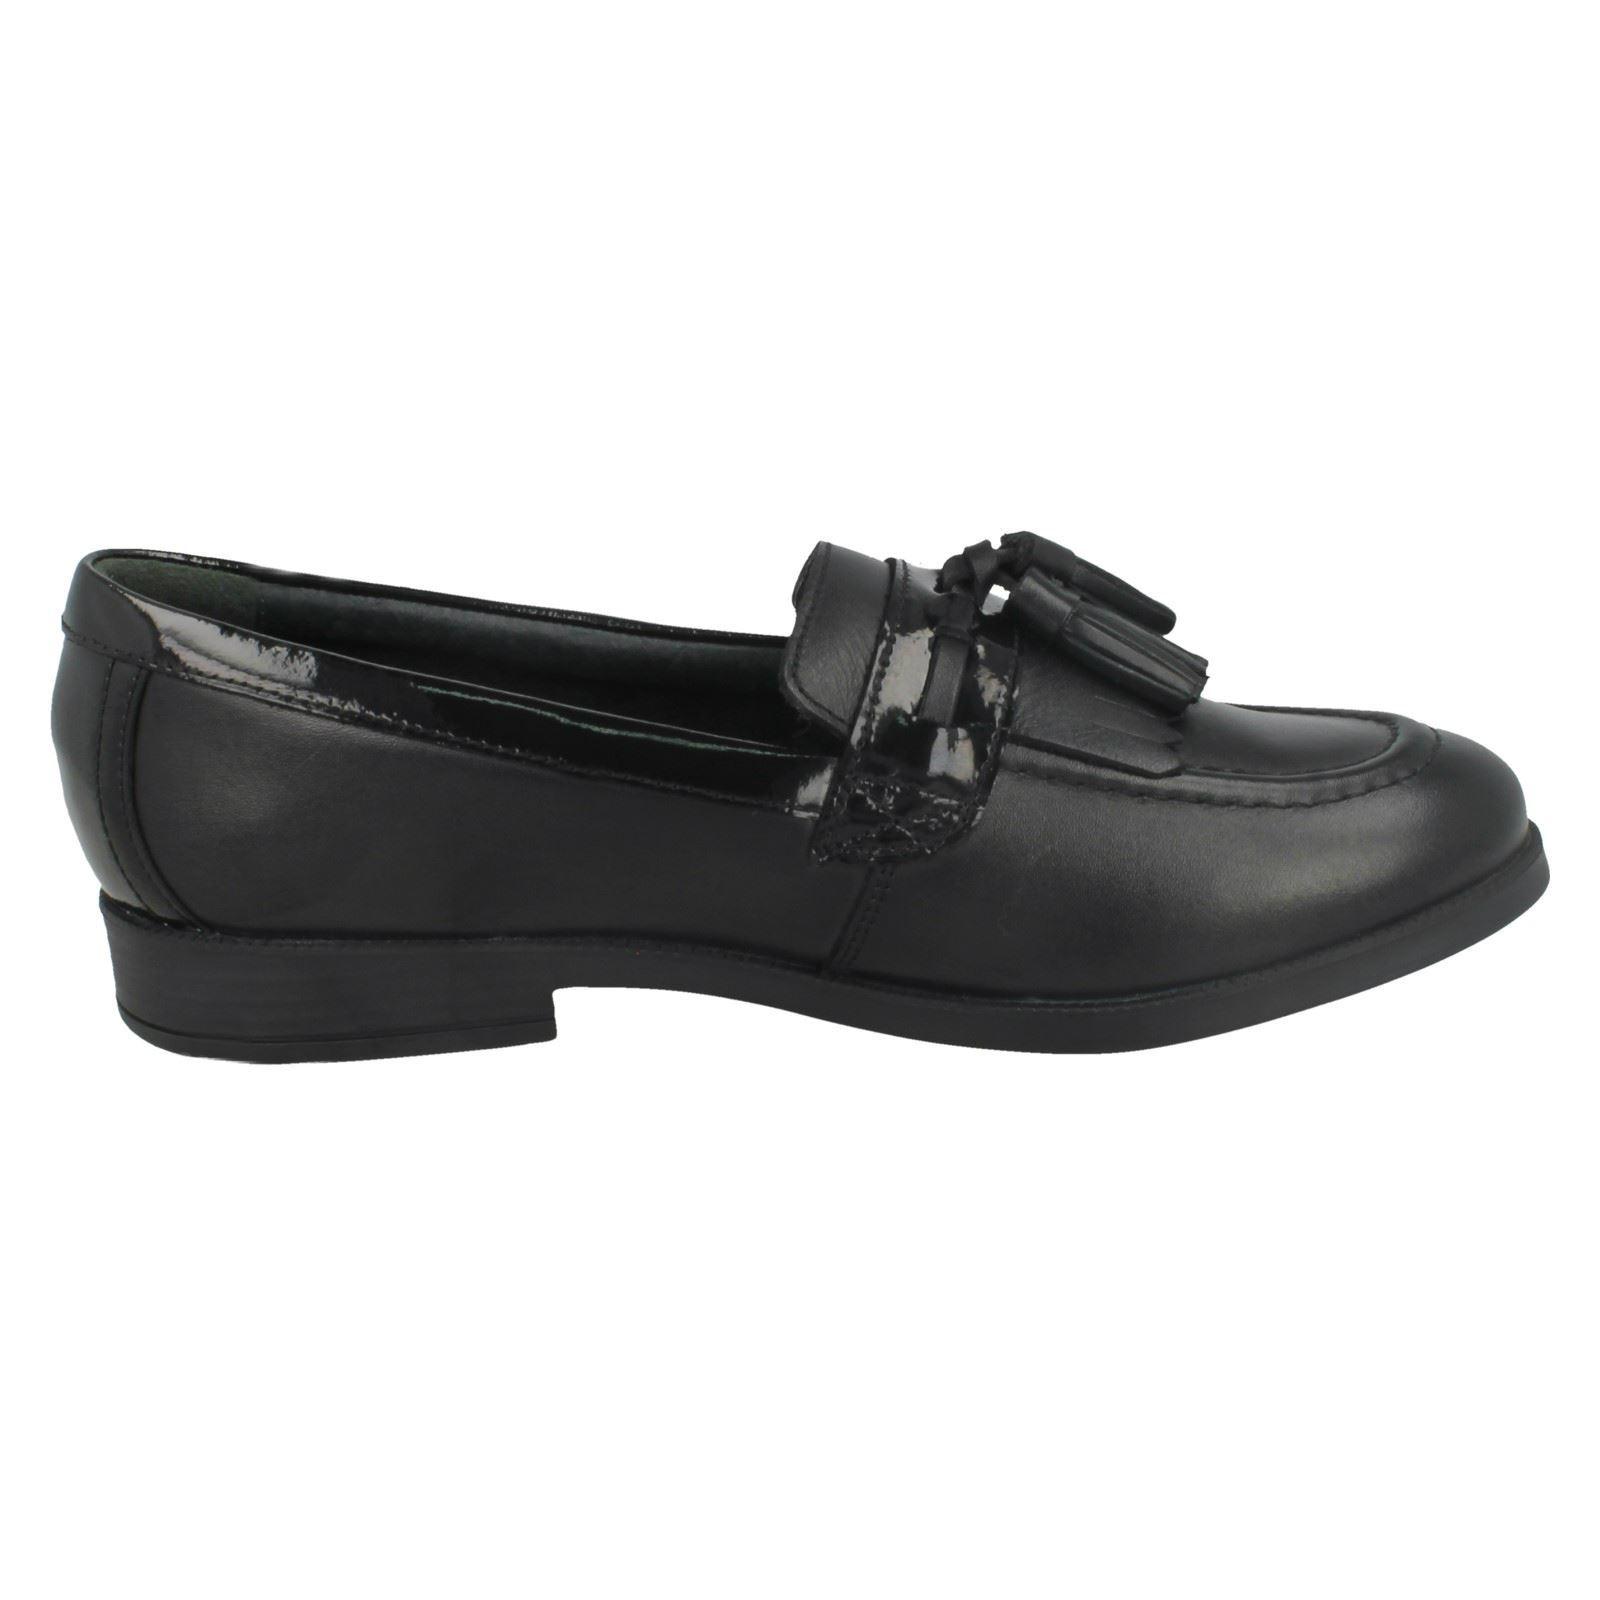 Girls Startrite Smart Flats /'Loafer/'